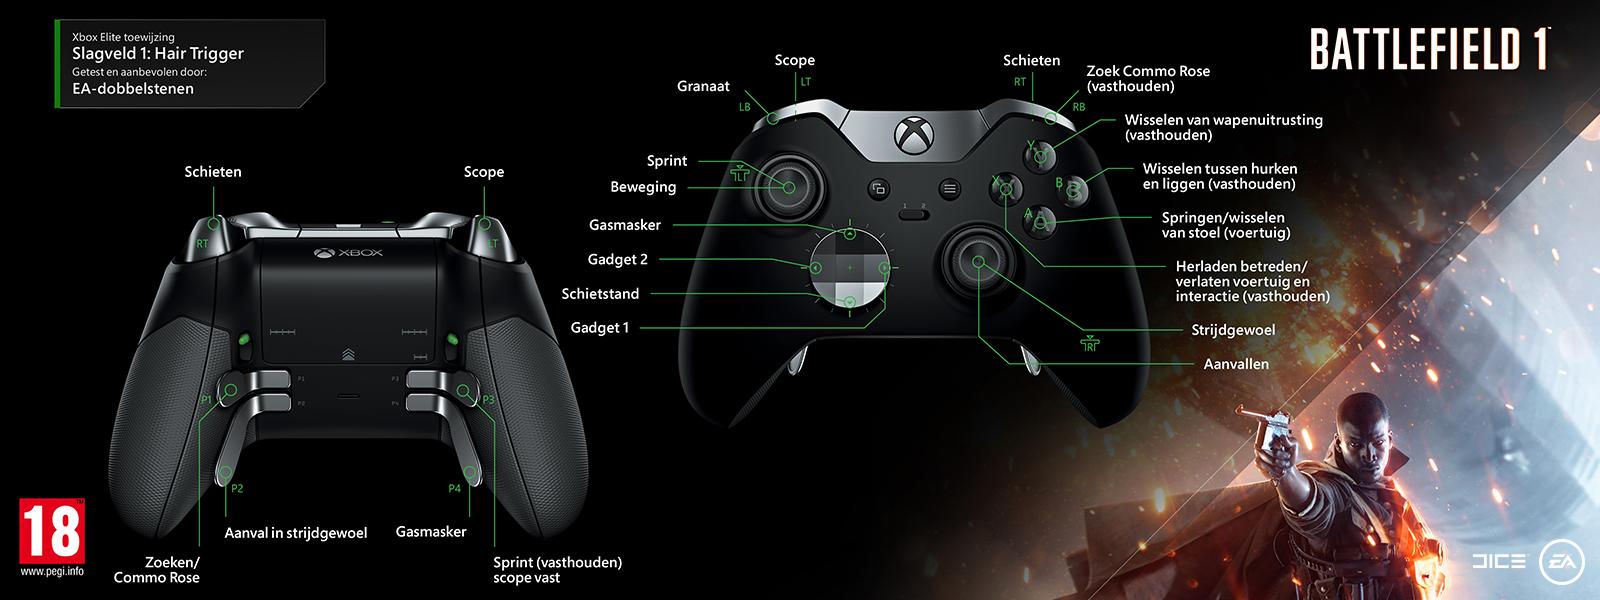 Battlefield 1 - Hair Trigger-mapping